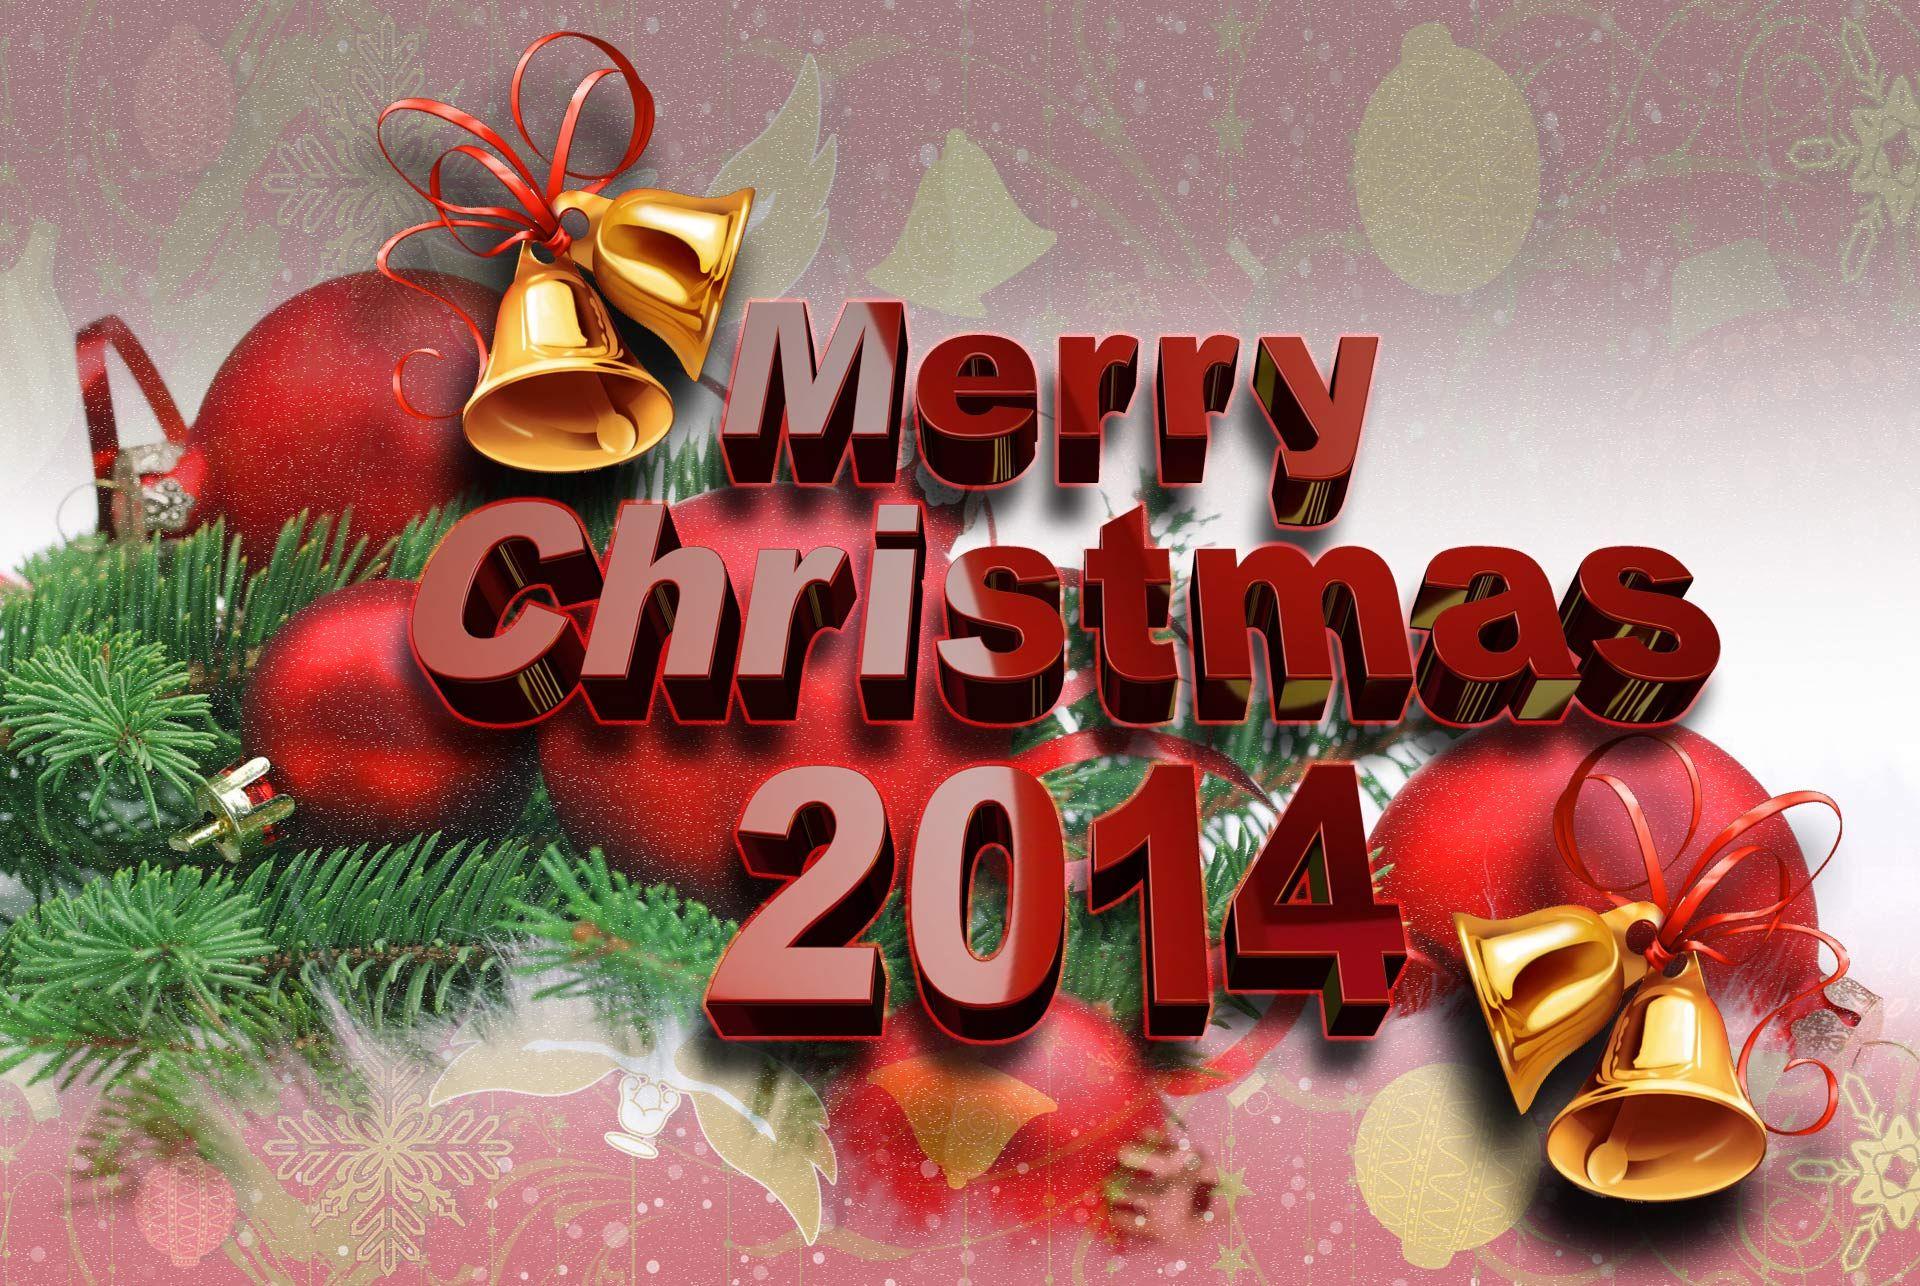 girl santa clause christms hd wallpaper merry christmas, santa